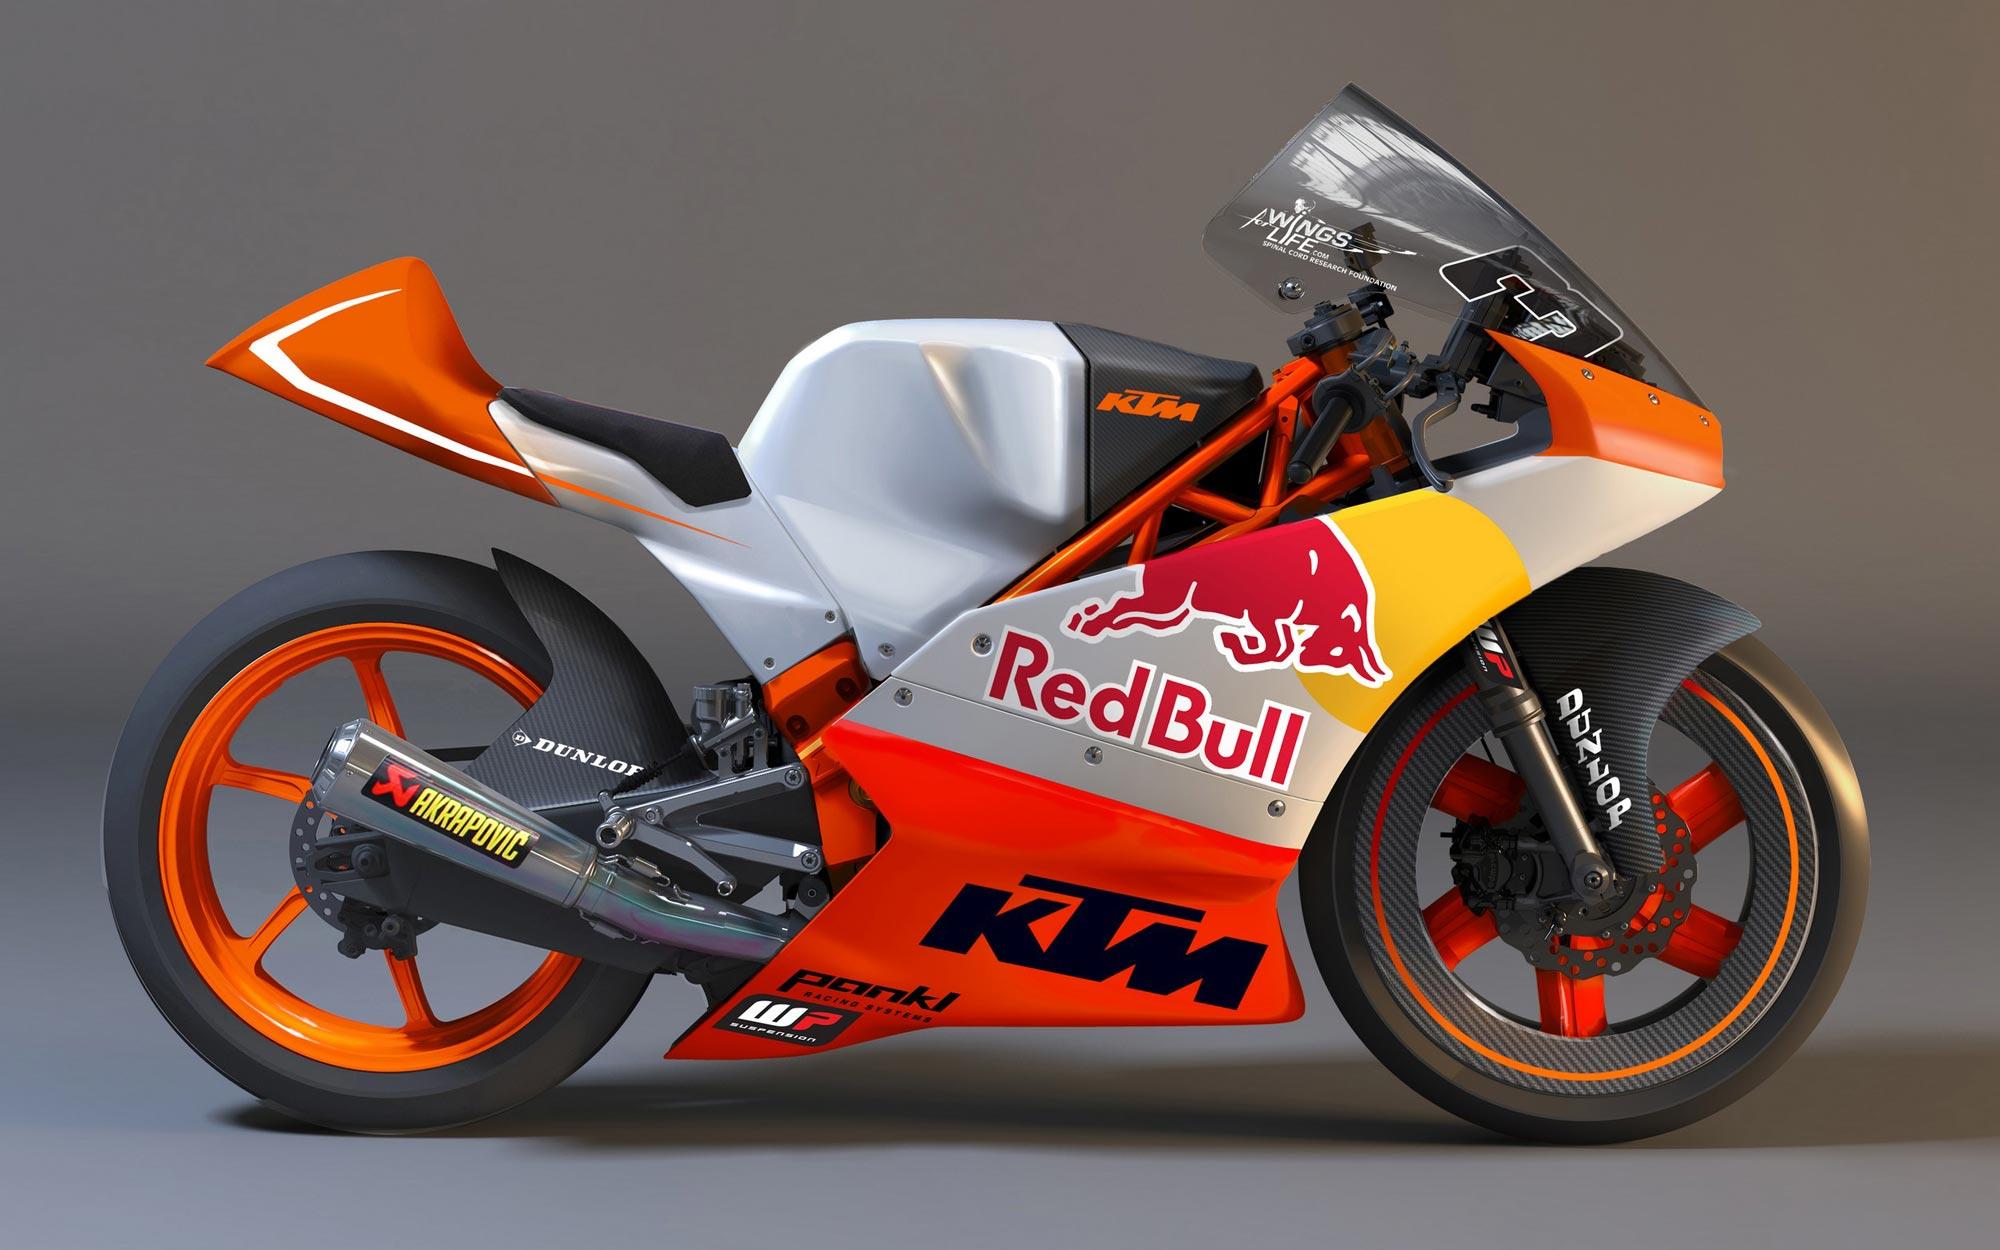 KTM's 350cc Duke and sports bike confirmed   Visordown